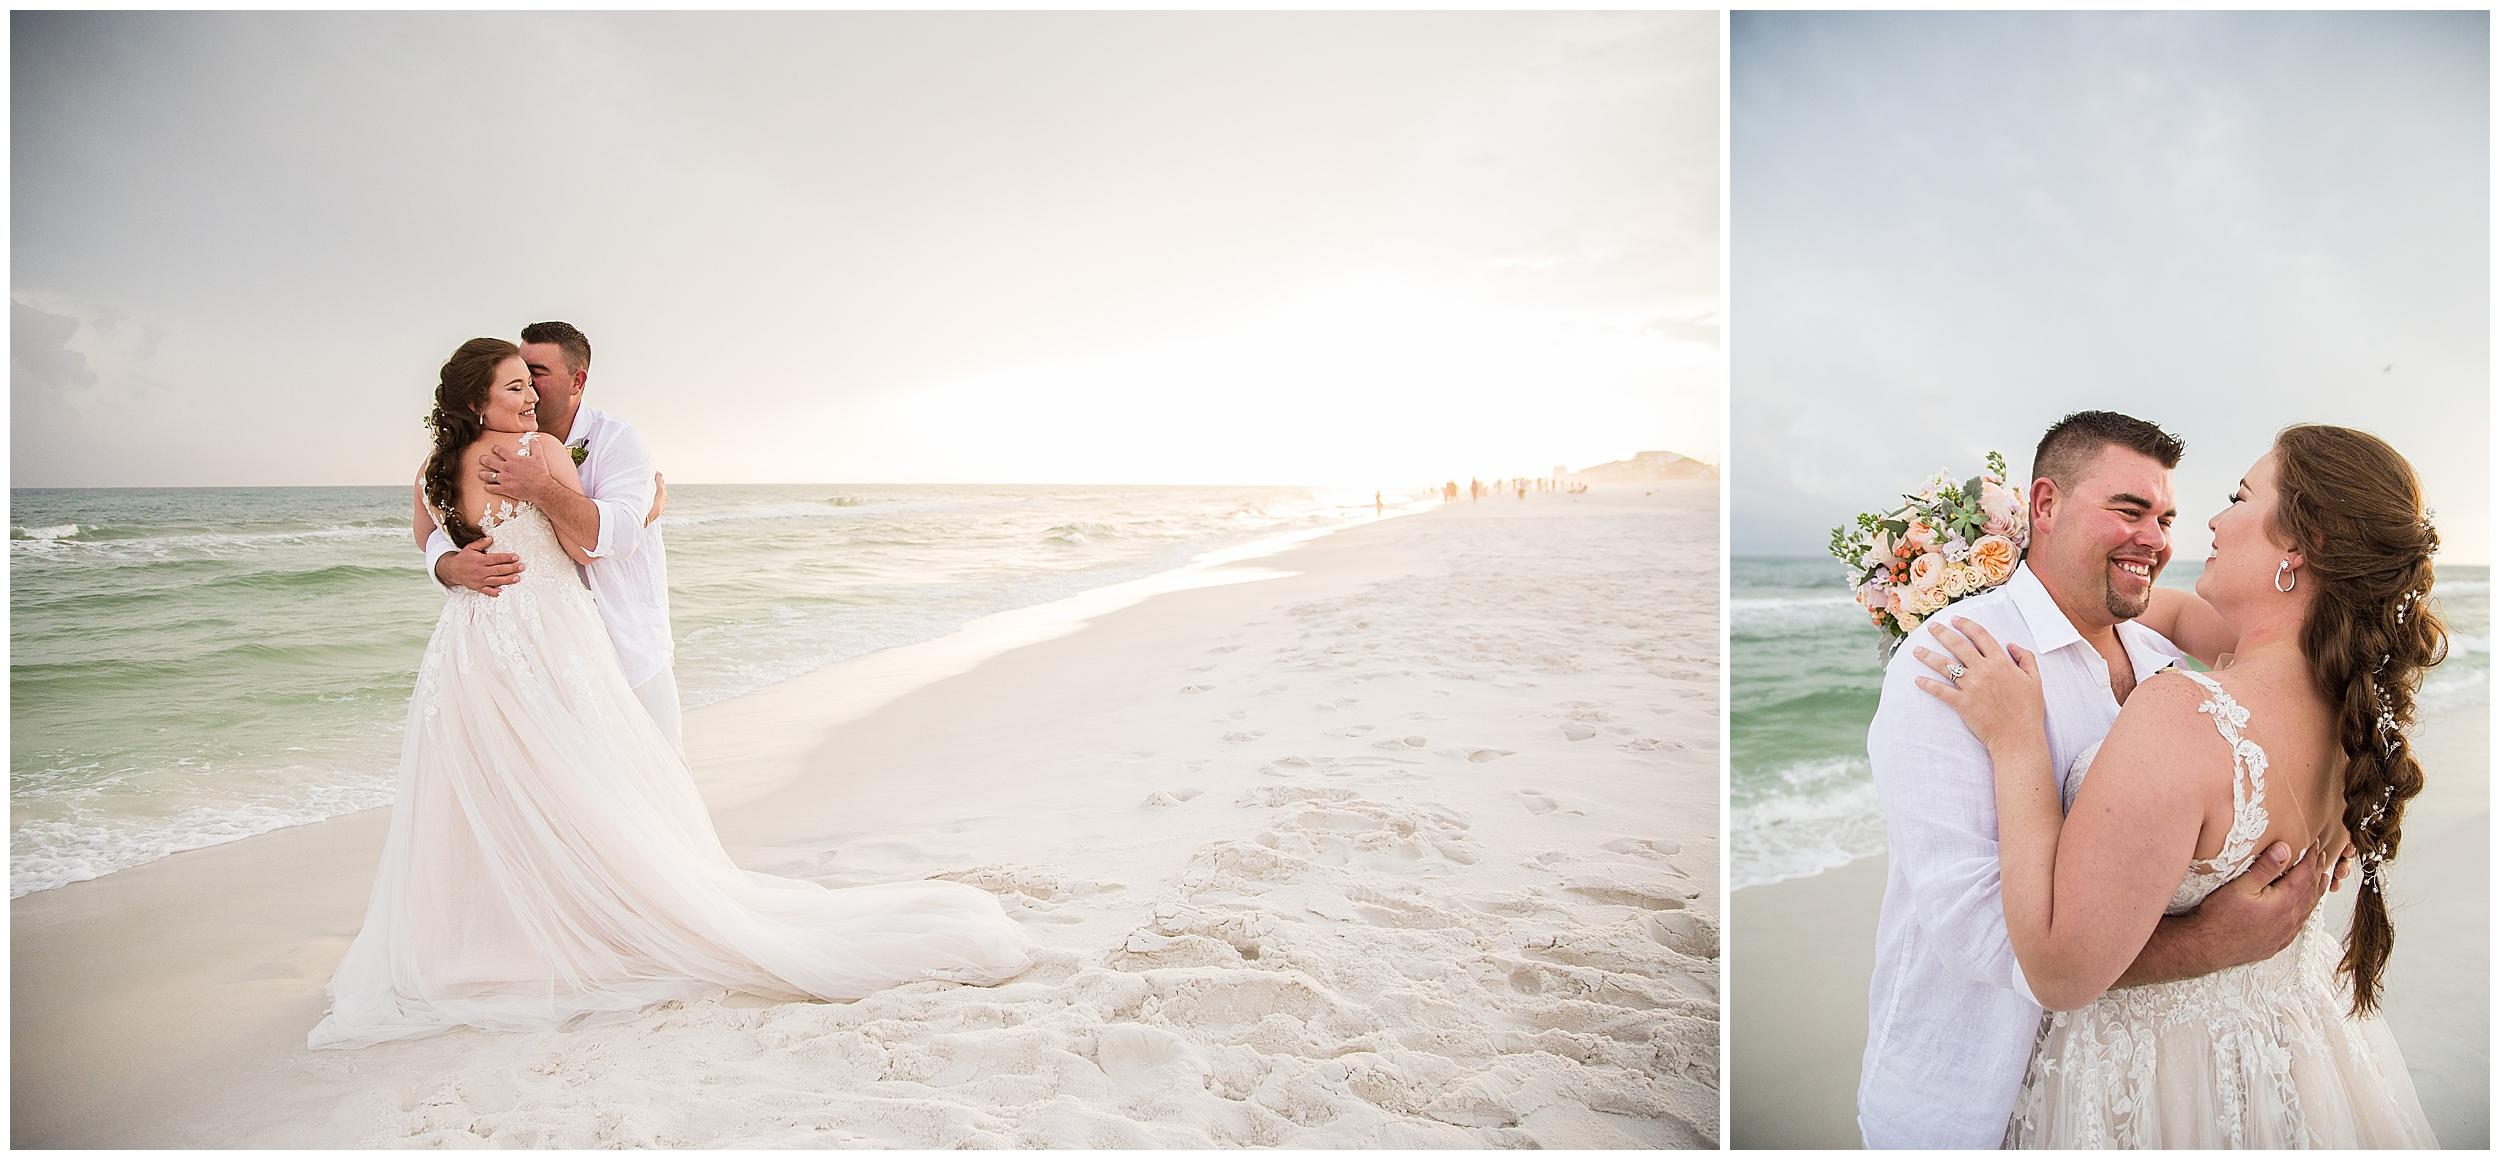 30a-Destin-Florida-Wedding-Photography-Jennie-Jeremy_0035.jpg